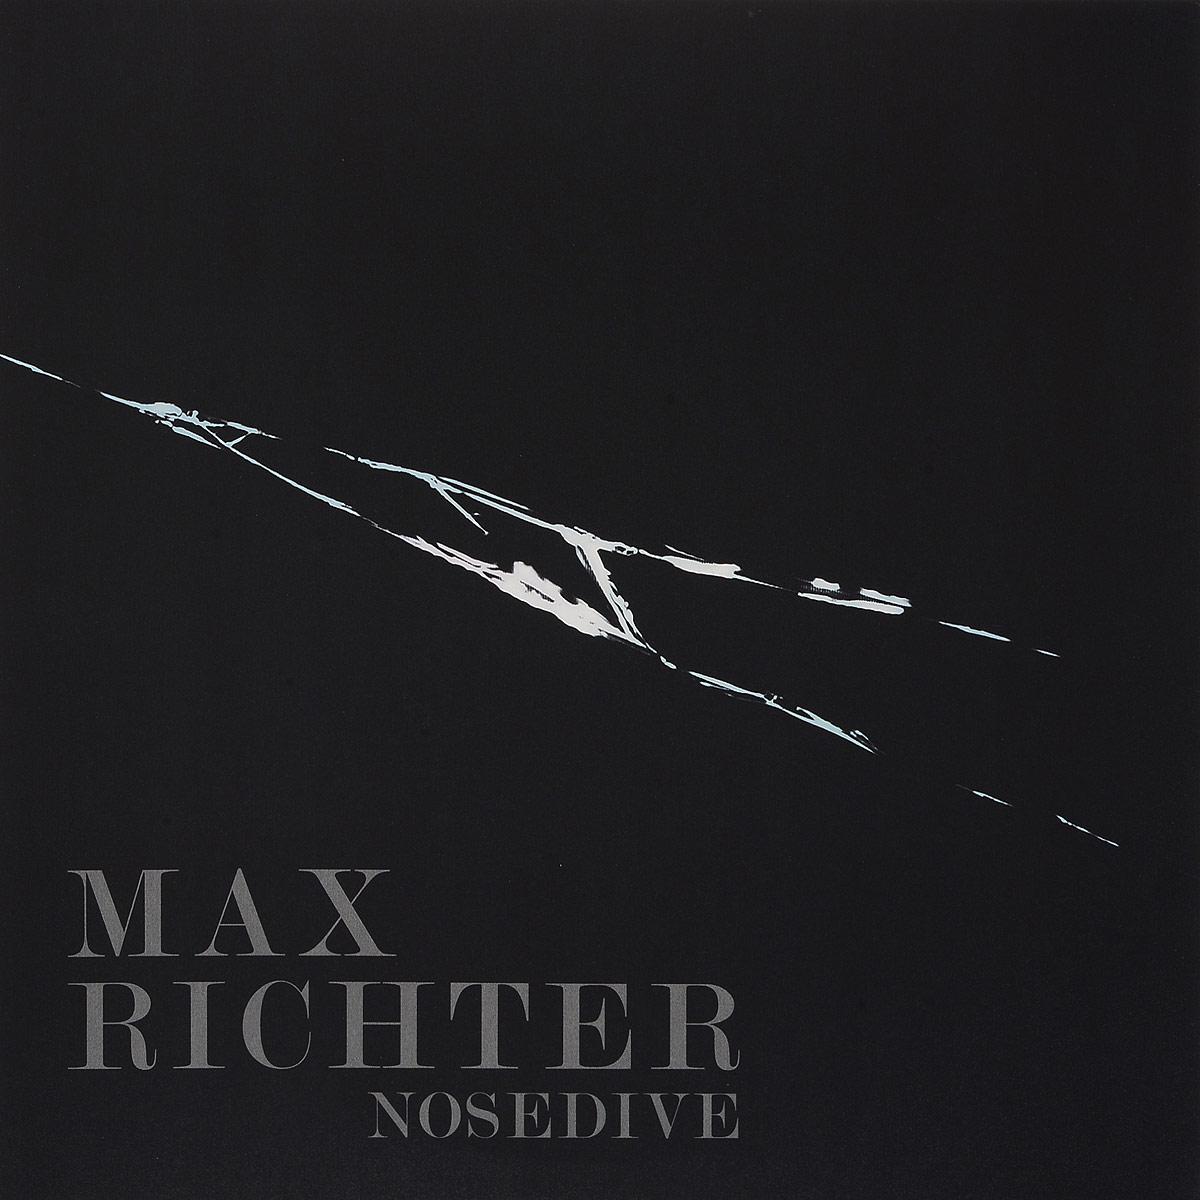 все цены на Макс Рихтер Max Richter. Nosedive (LP) онлайн